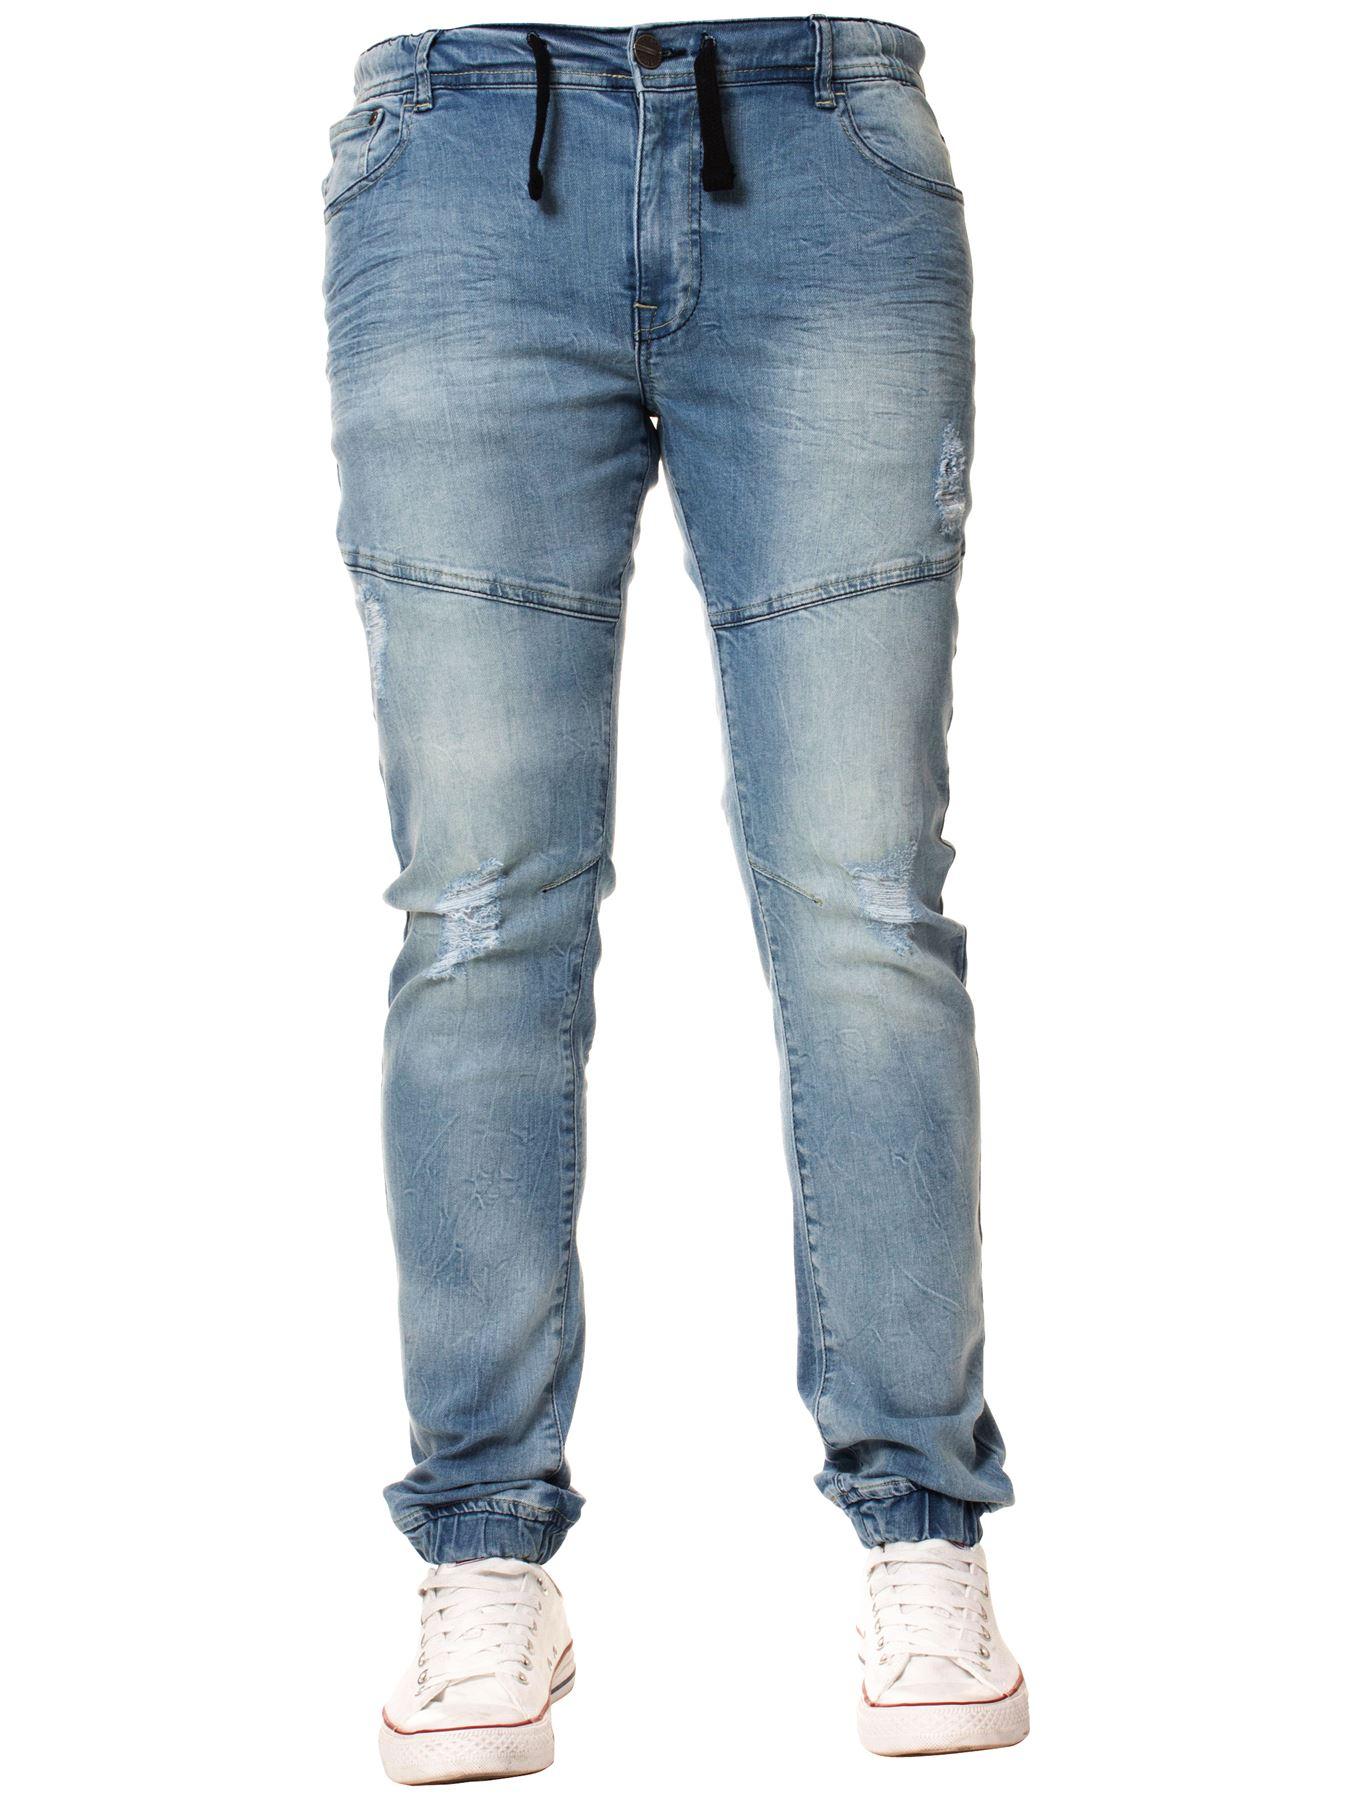 Enzo-Mens-Cuffed-Jeans-Stretch-Fit-Ripped-Denim-Jogger-Pants-Big-Tall-All-Waists thumbnail 12